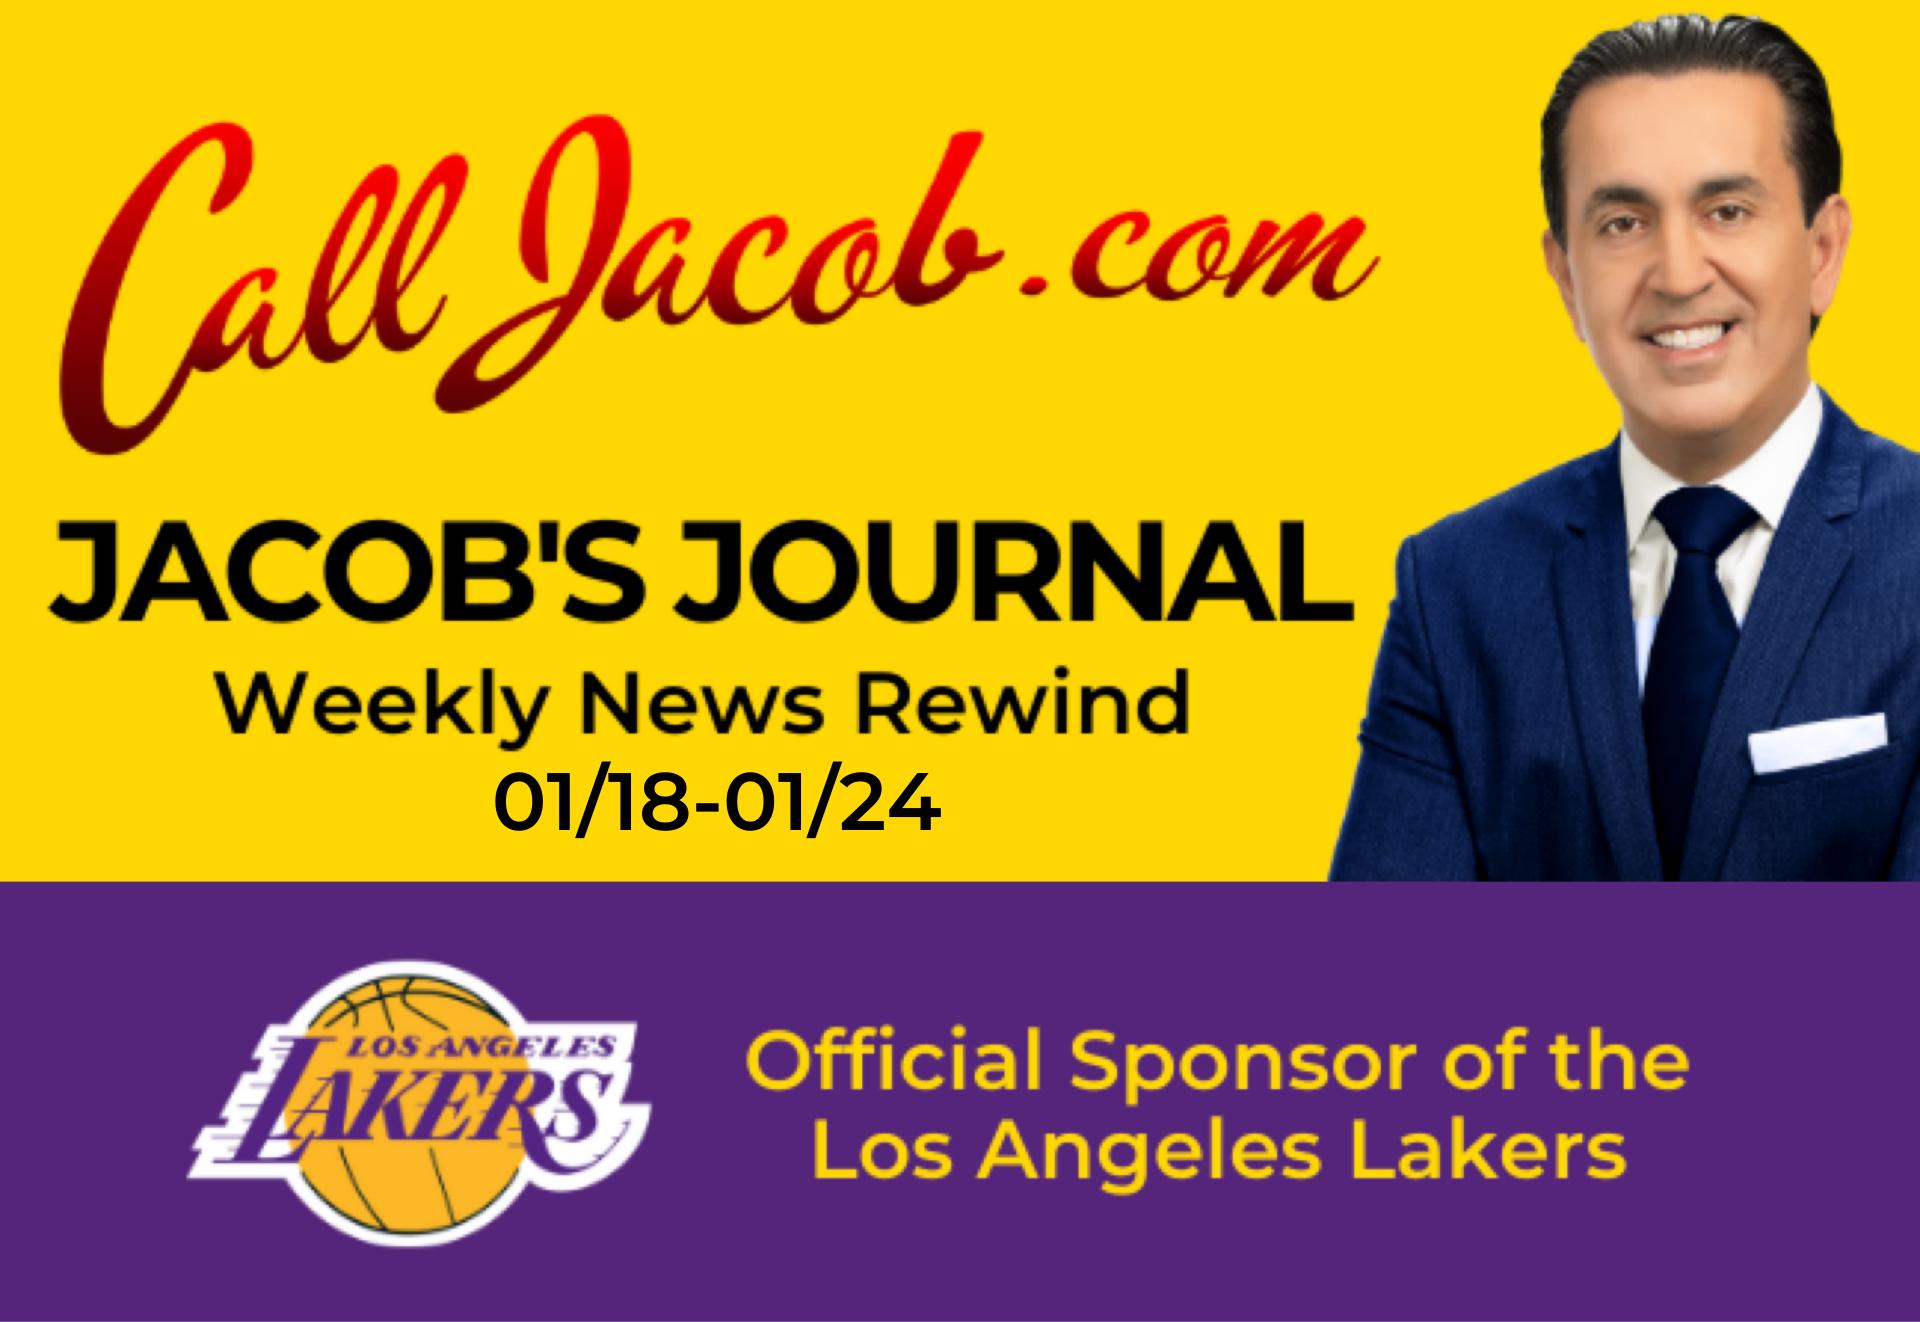 JacobsJournalWeeklyNewsRewind January 18th to January 24th